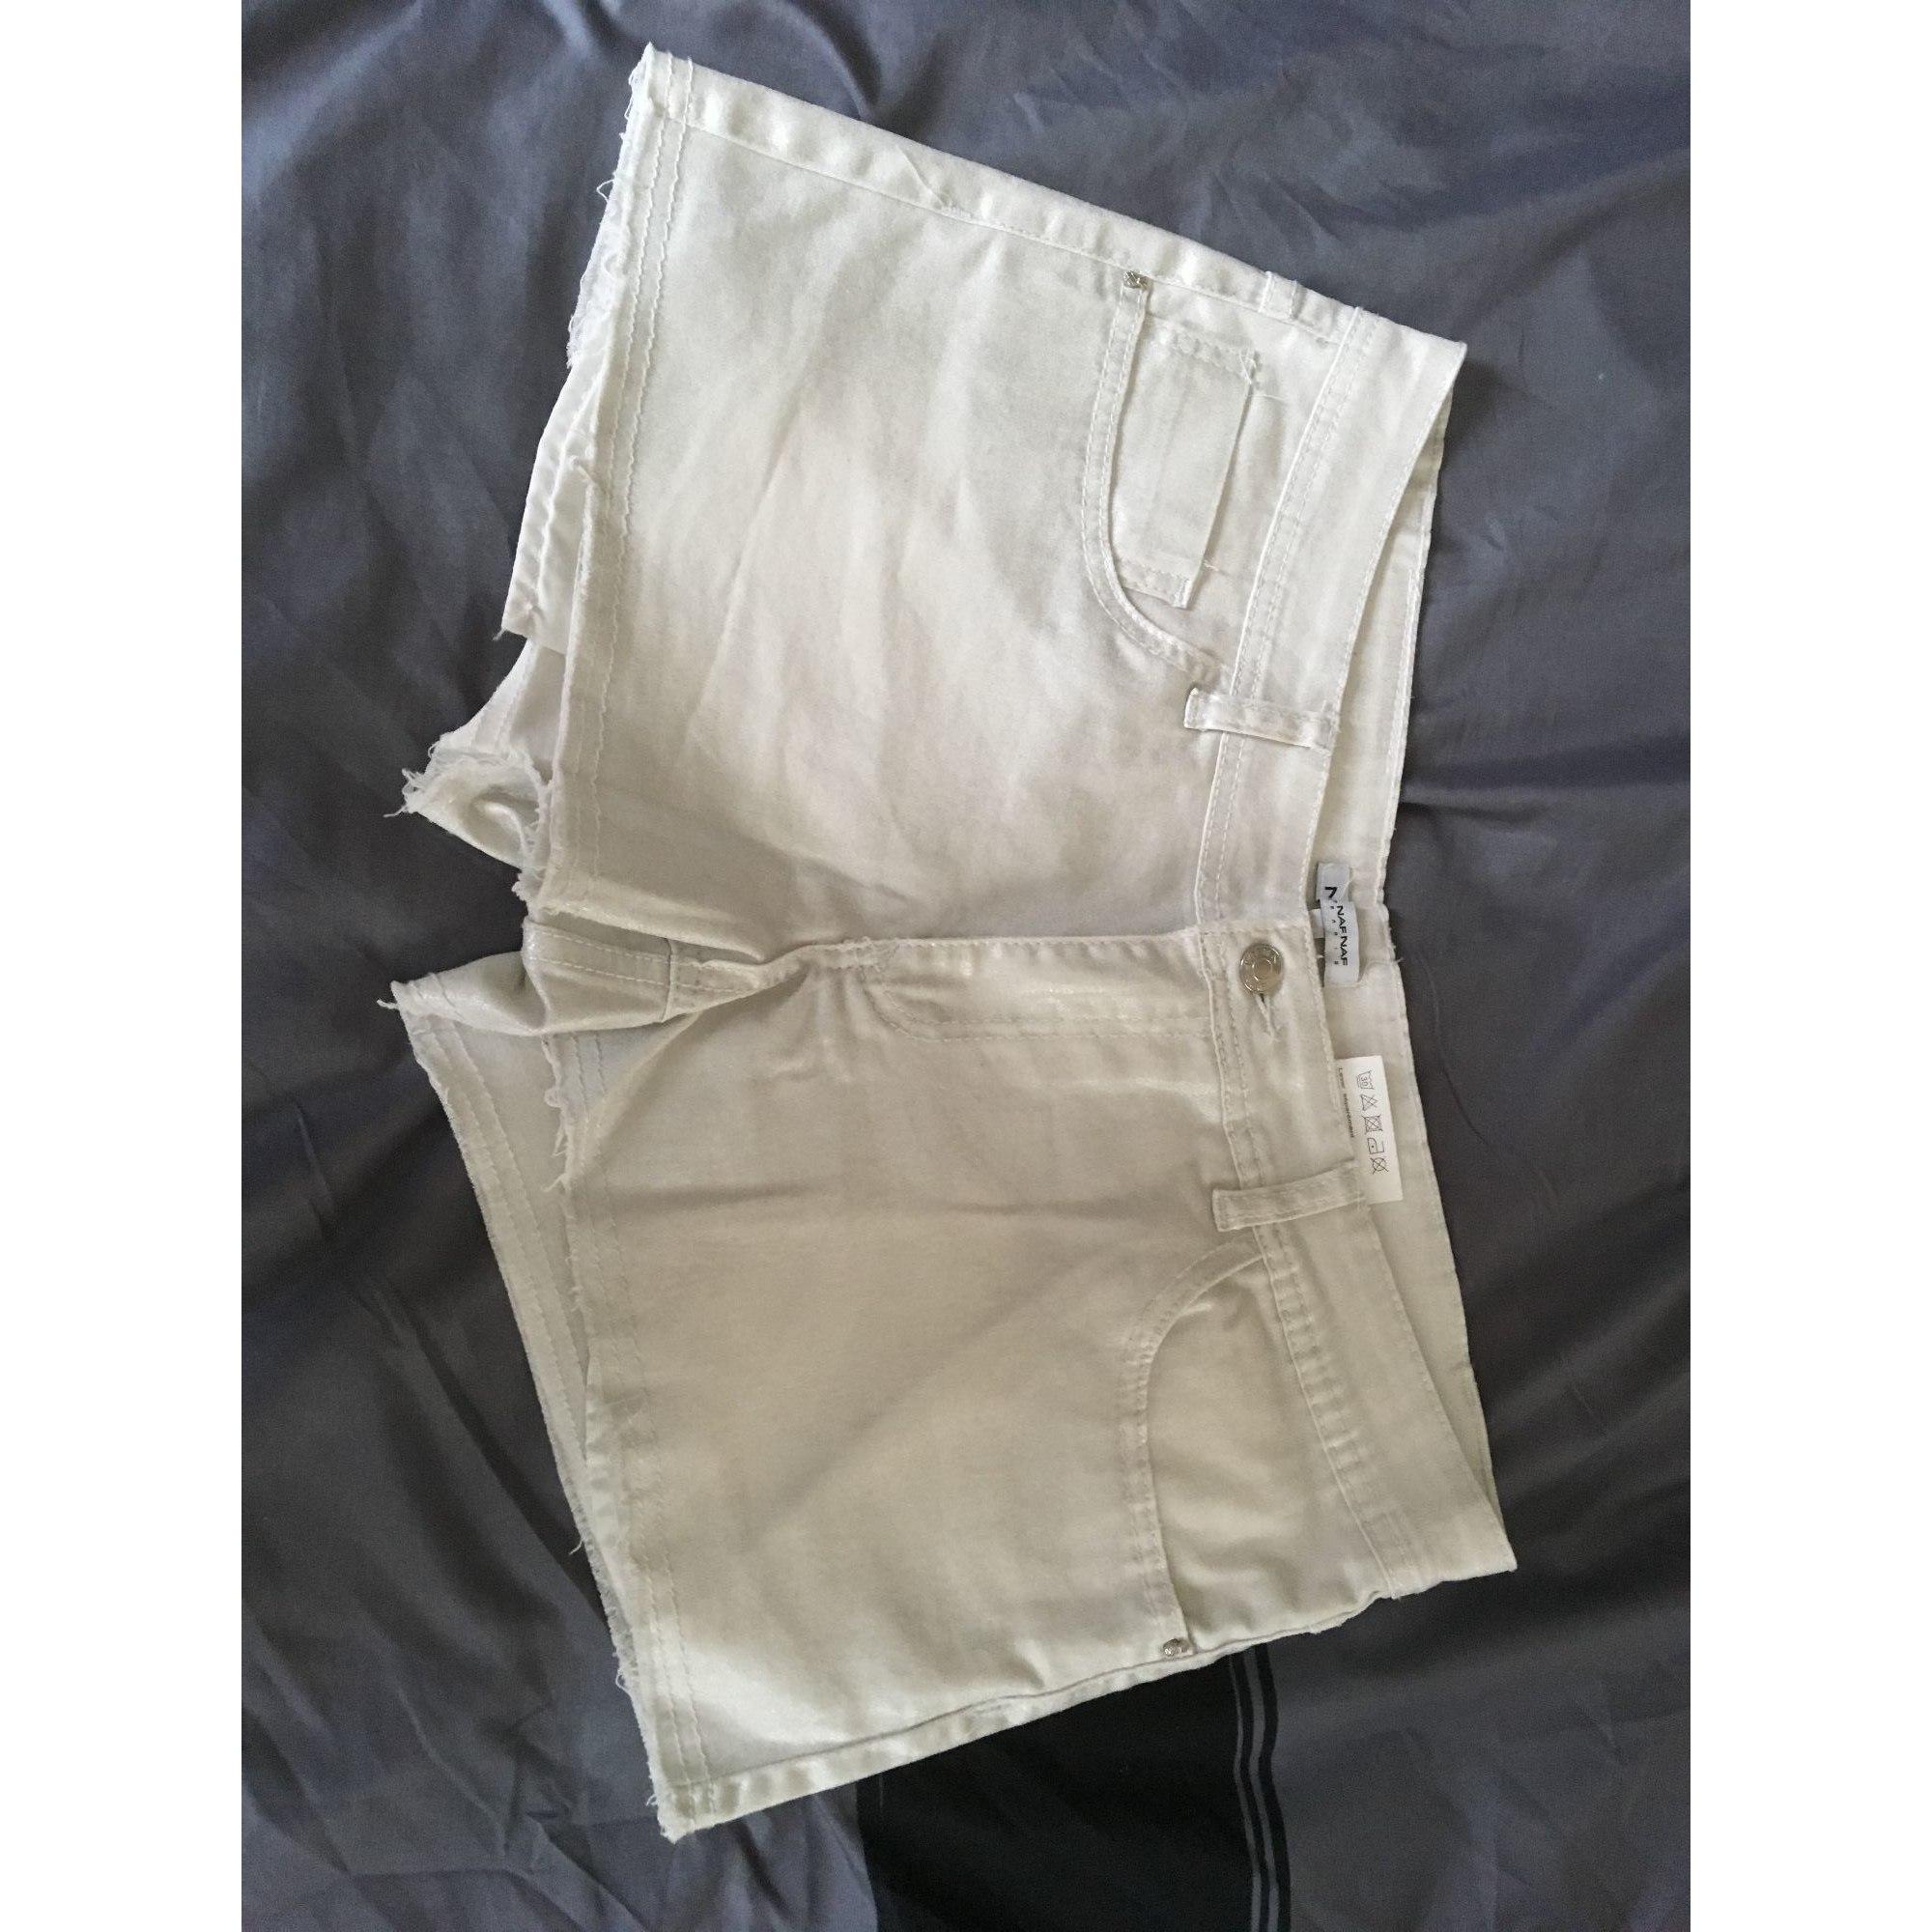 Short NAF NAF Blanc, blanc cassé, écru